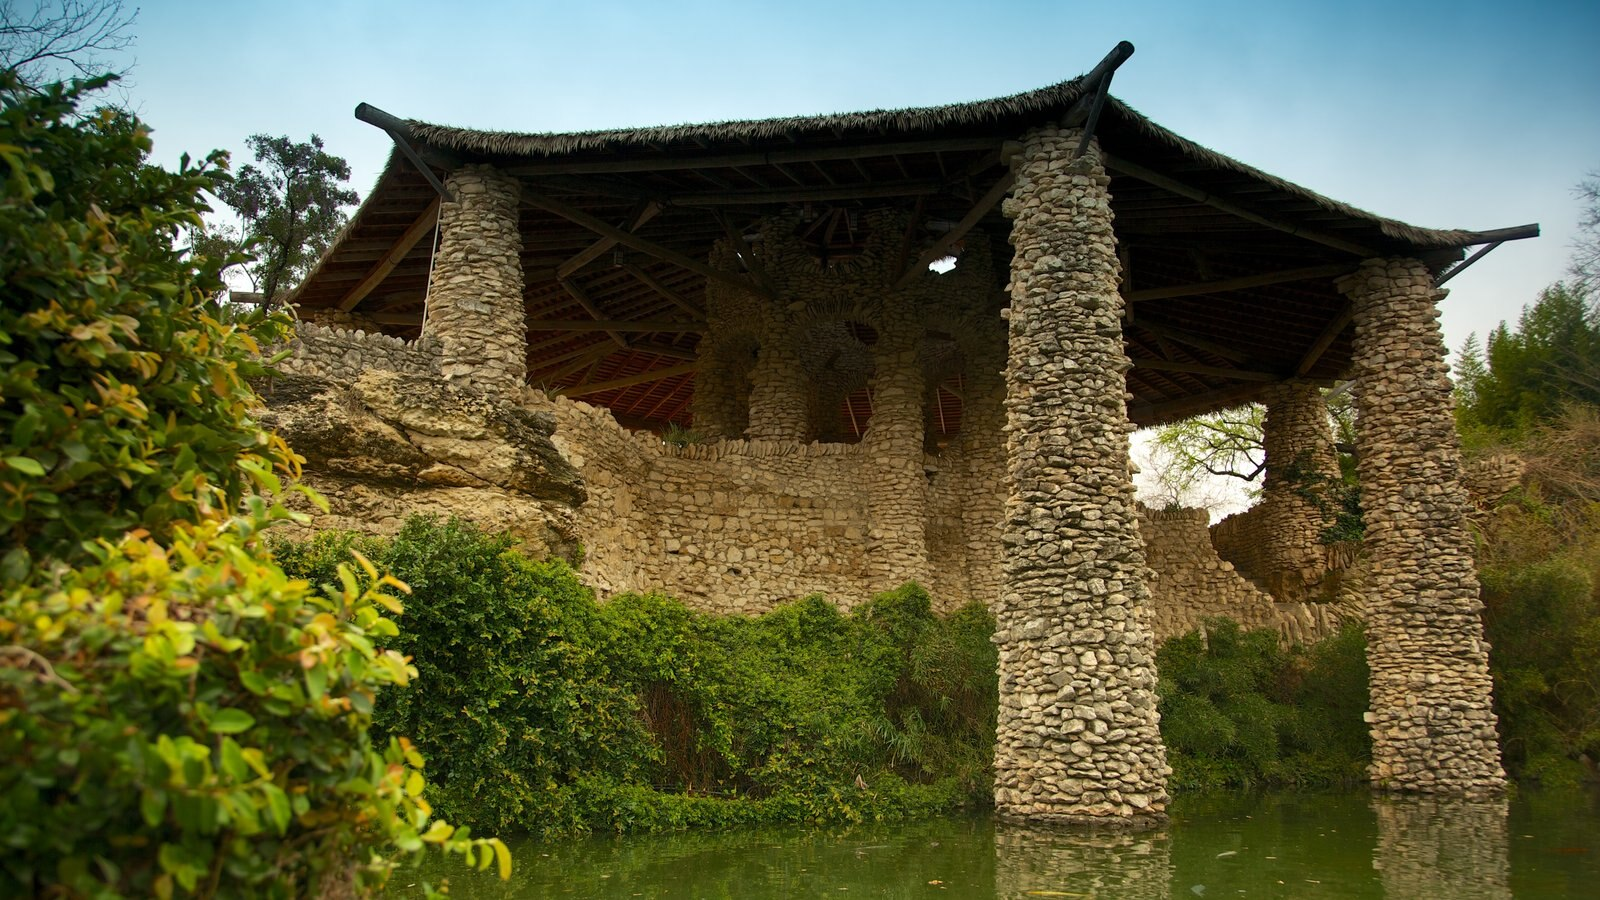 Gardens & Parks Pictures: View Images of San Antonio Japanese Tea Garden